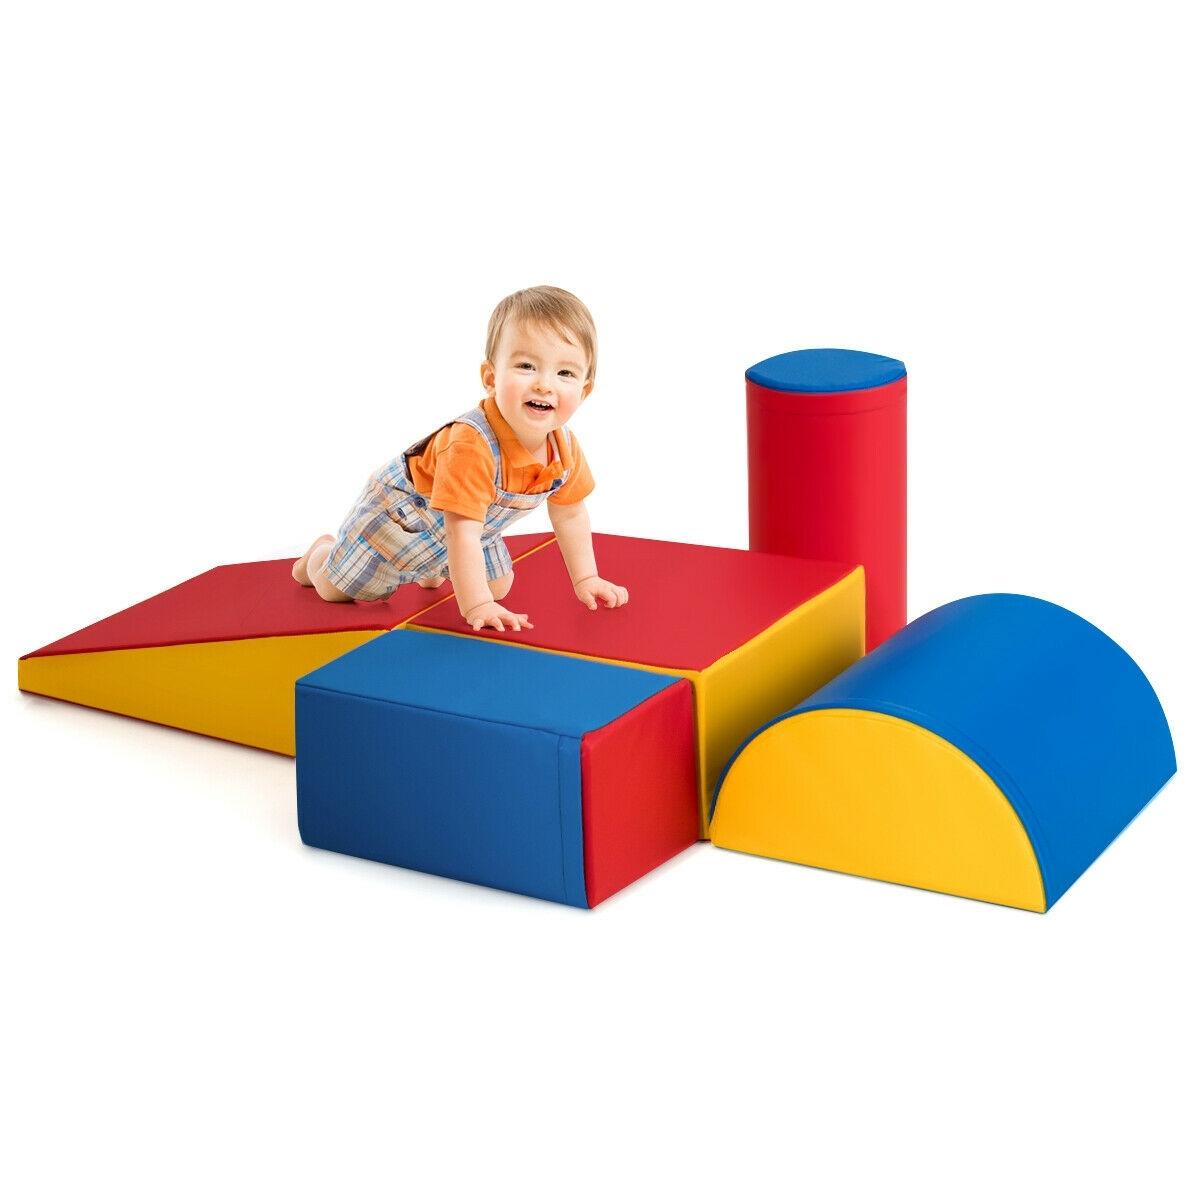 Image of 5-Piece Set Climb Activity Play Safe Foam Blocks